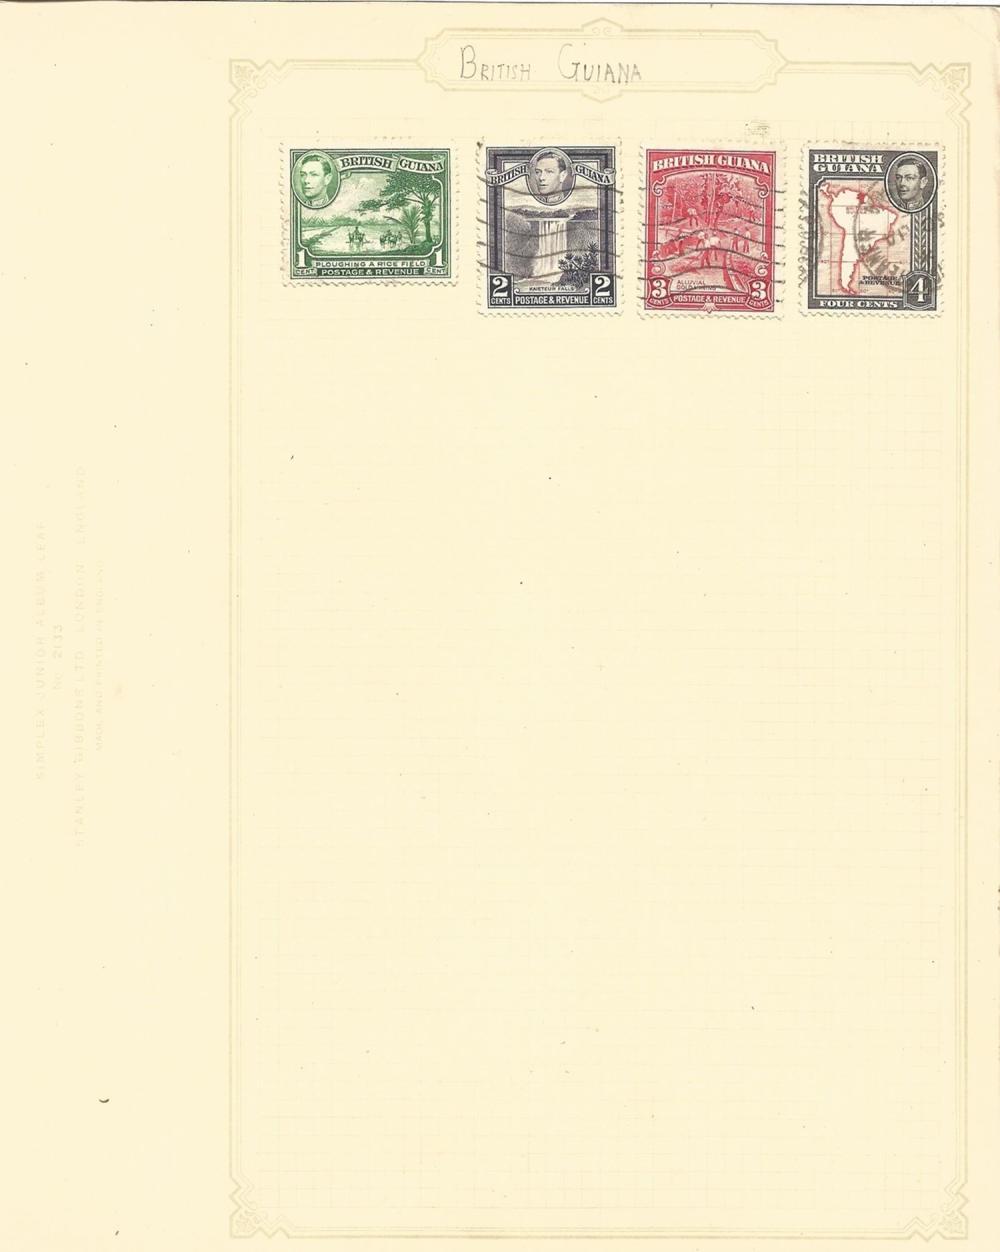 British Commonwealth, including Newfoundland, Cyprus, Gibraltar, Jamaica, Gold Coast, approx. 45.